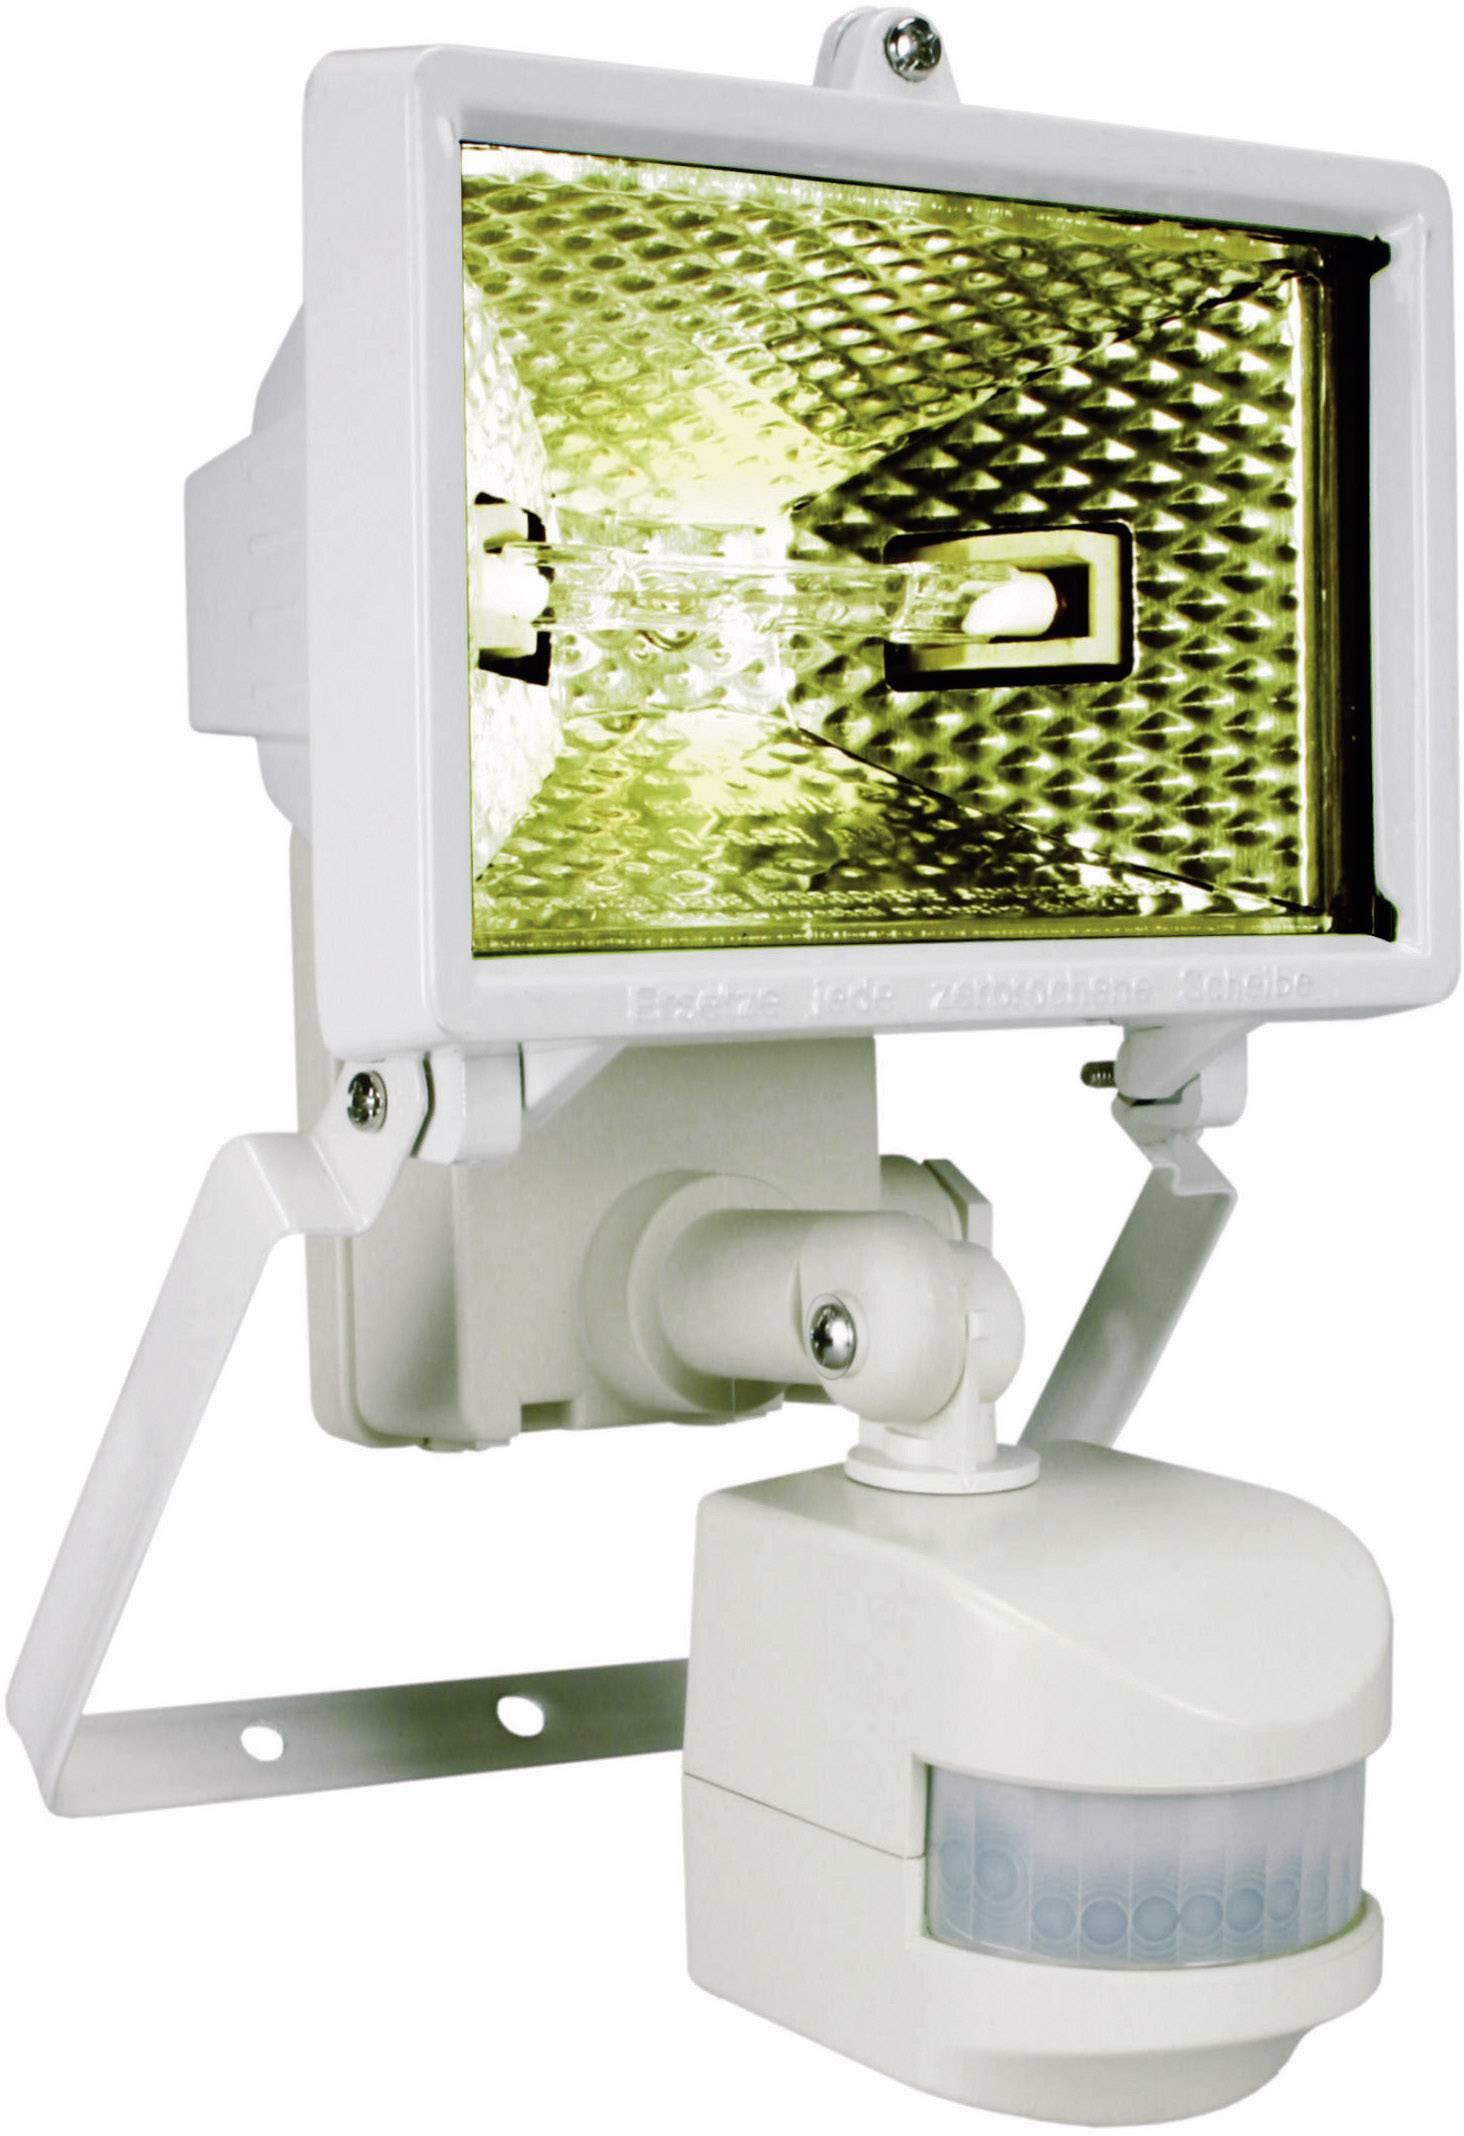 Halogénový reflektor s detektorom pohybu, R7s, 120 W, IP44, biely